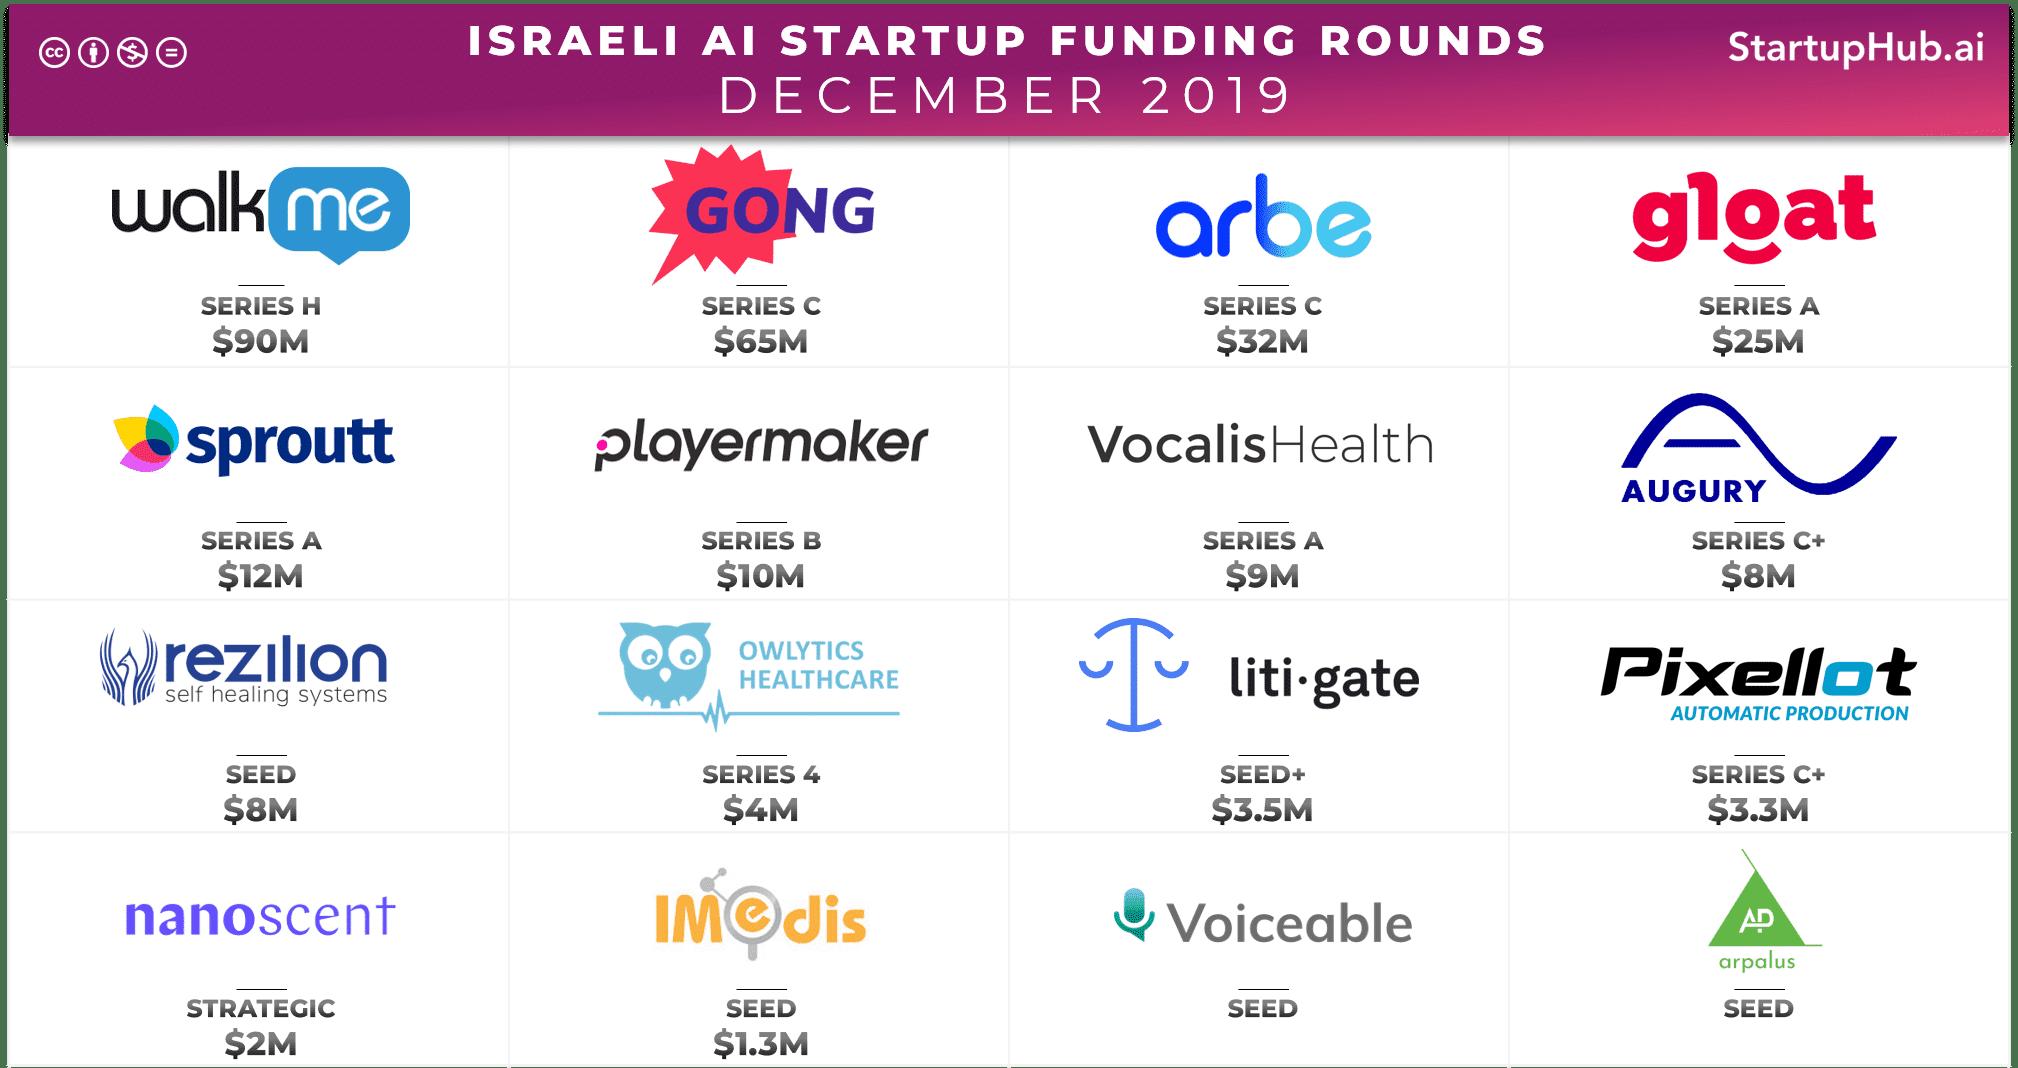 Israeli AI Startup Funding Rounds of December 2019